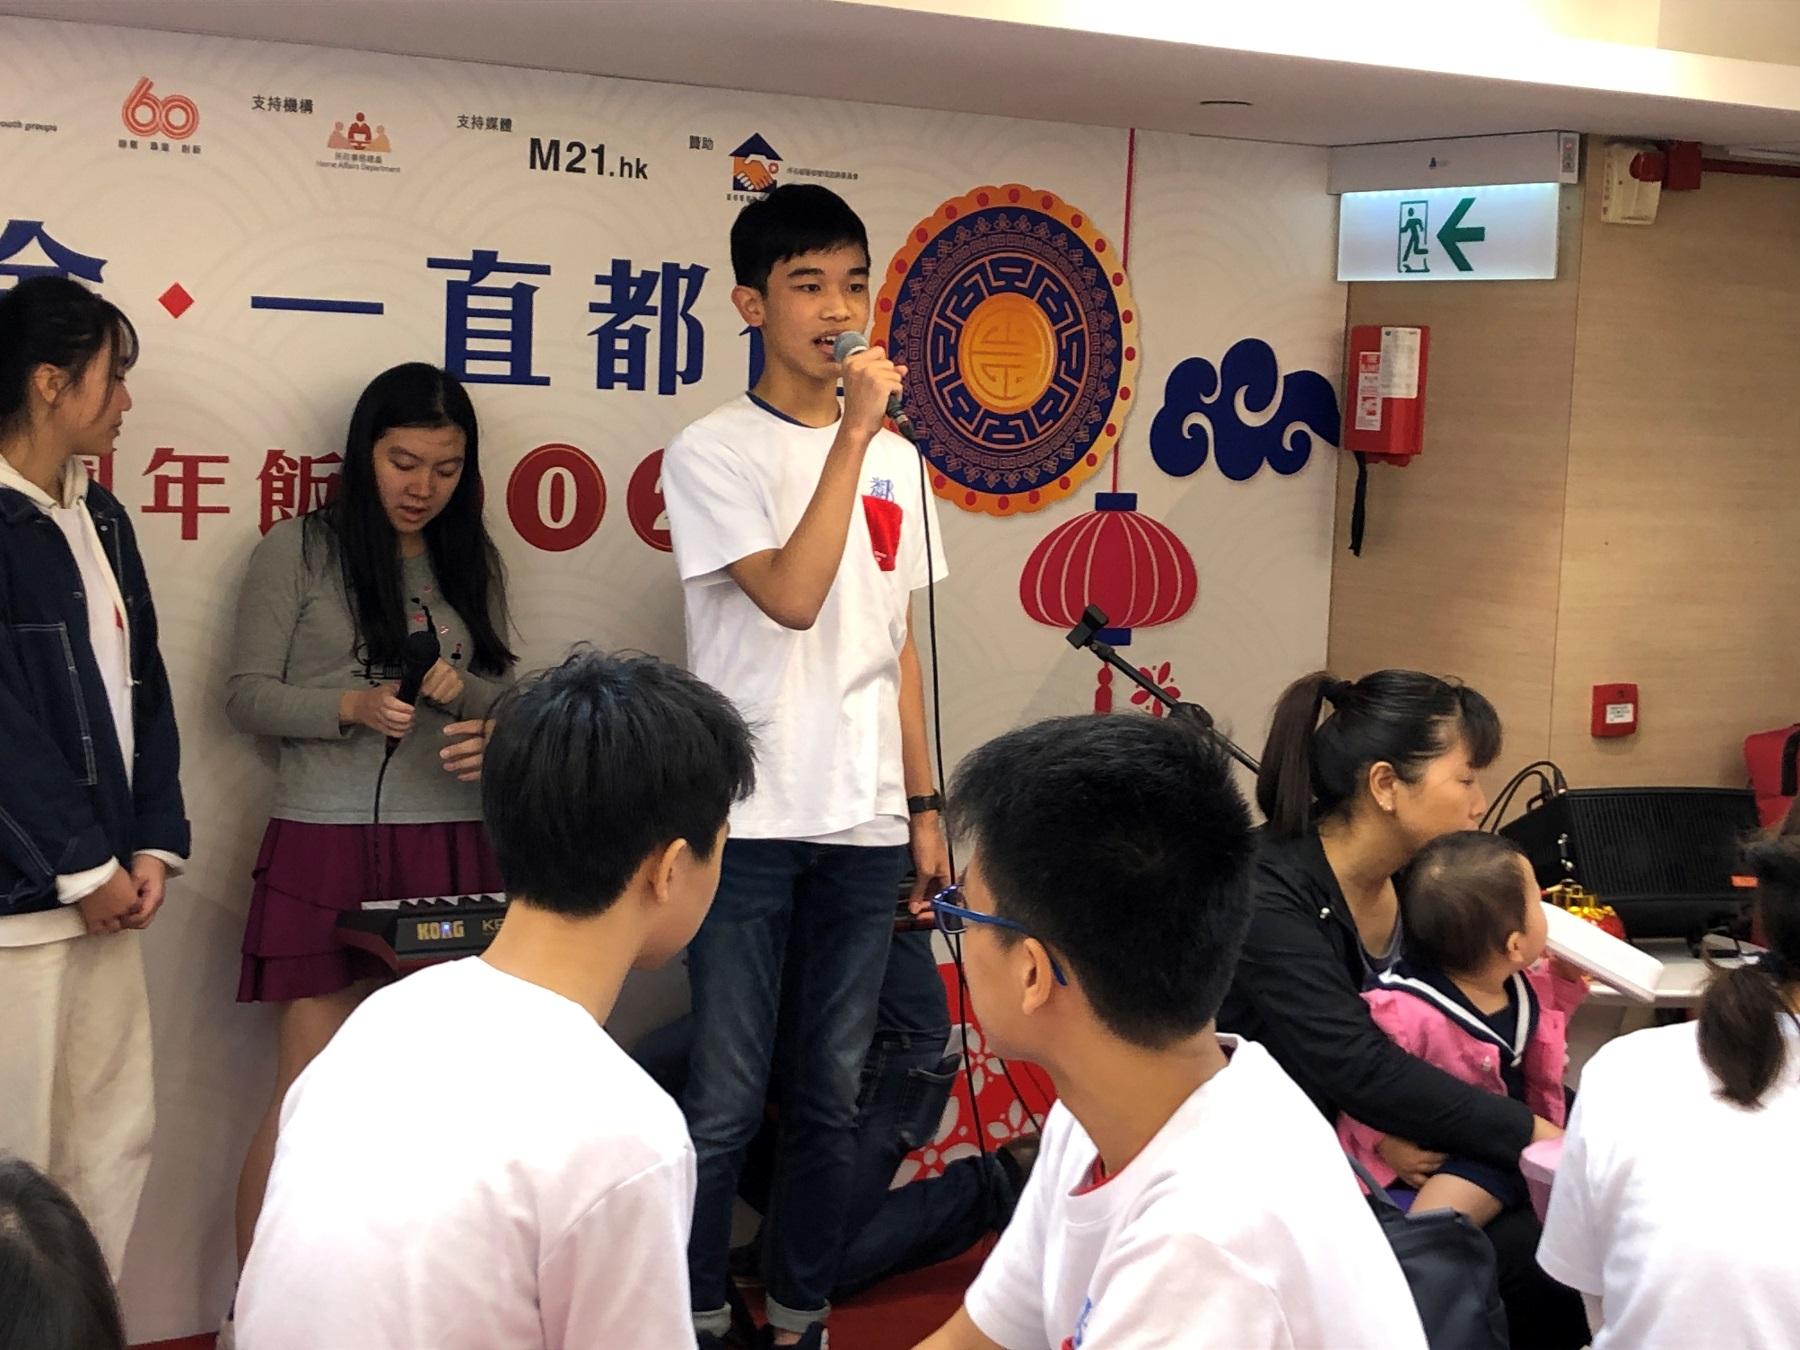 http://npc.edu.hk/sites/default/files/img_3583_1.jpg